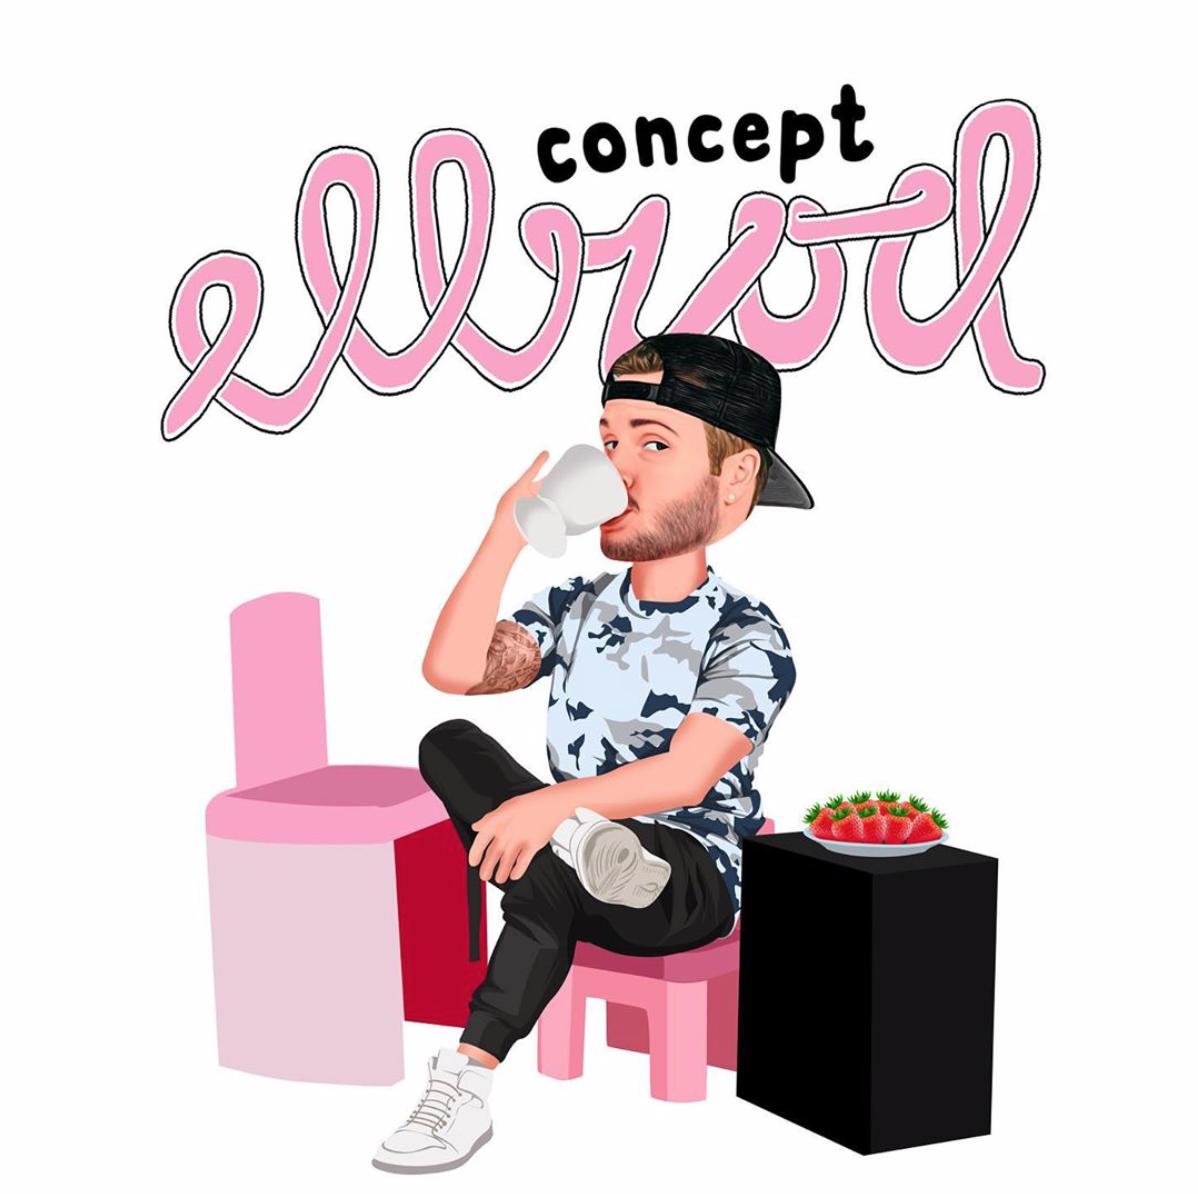 concept-artwork